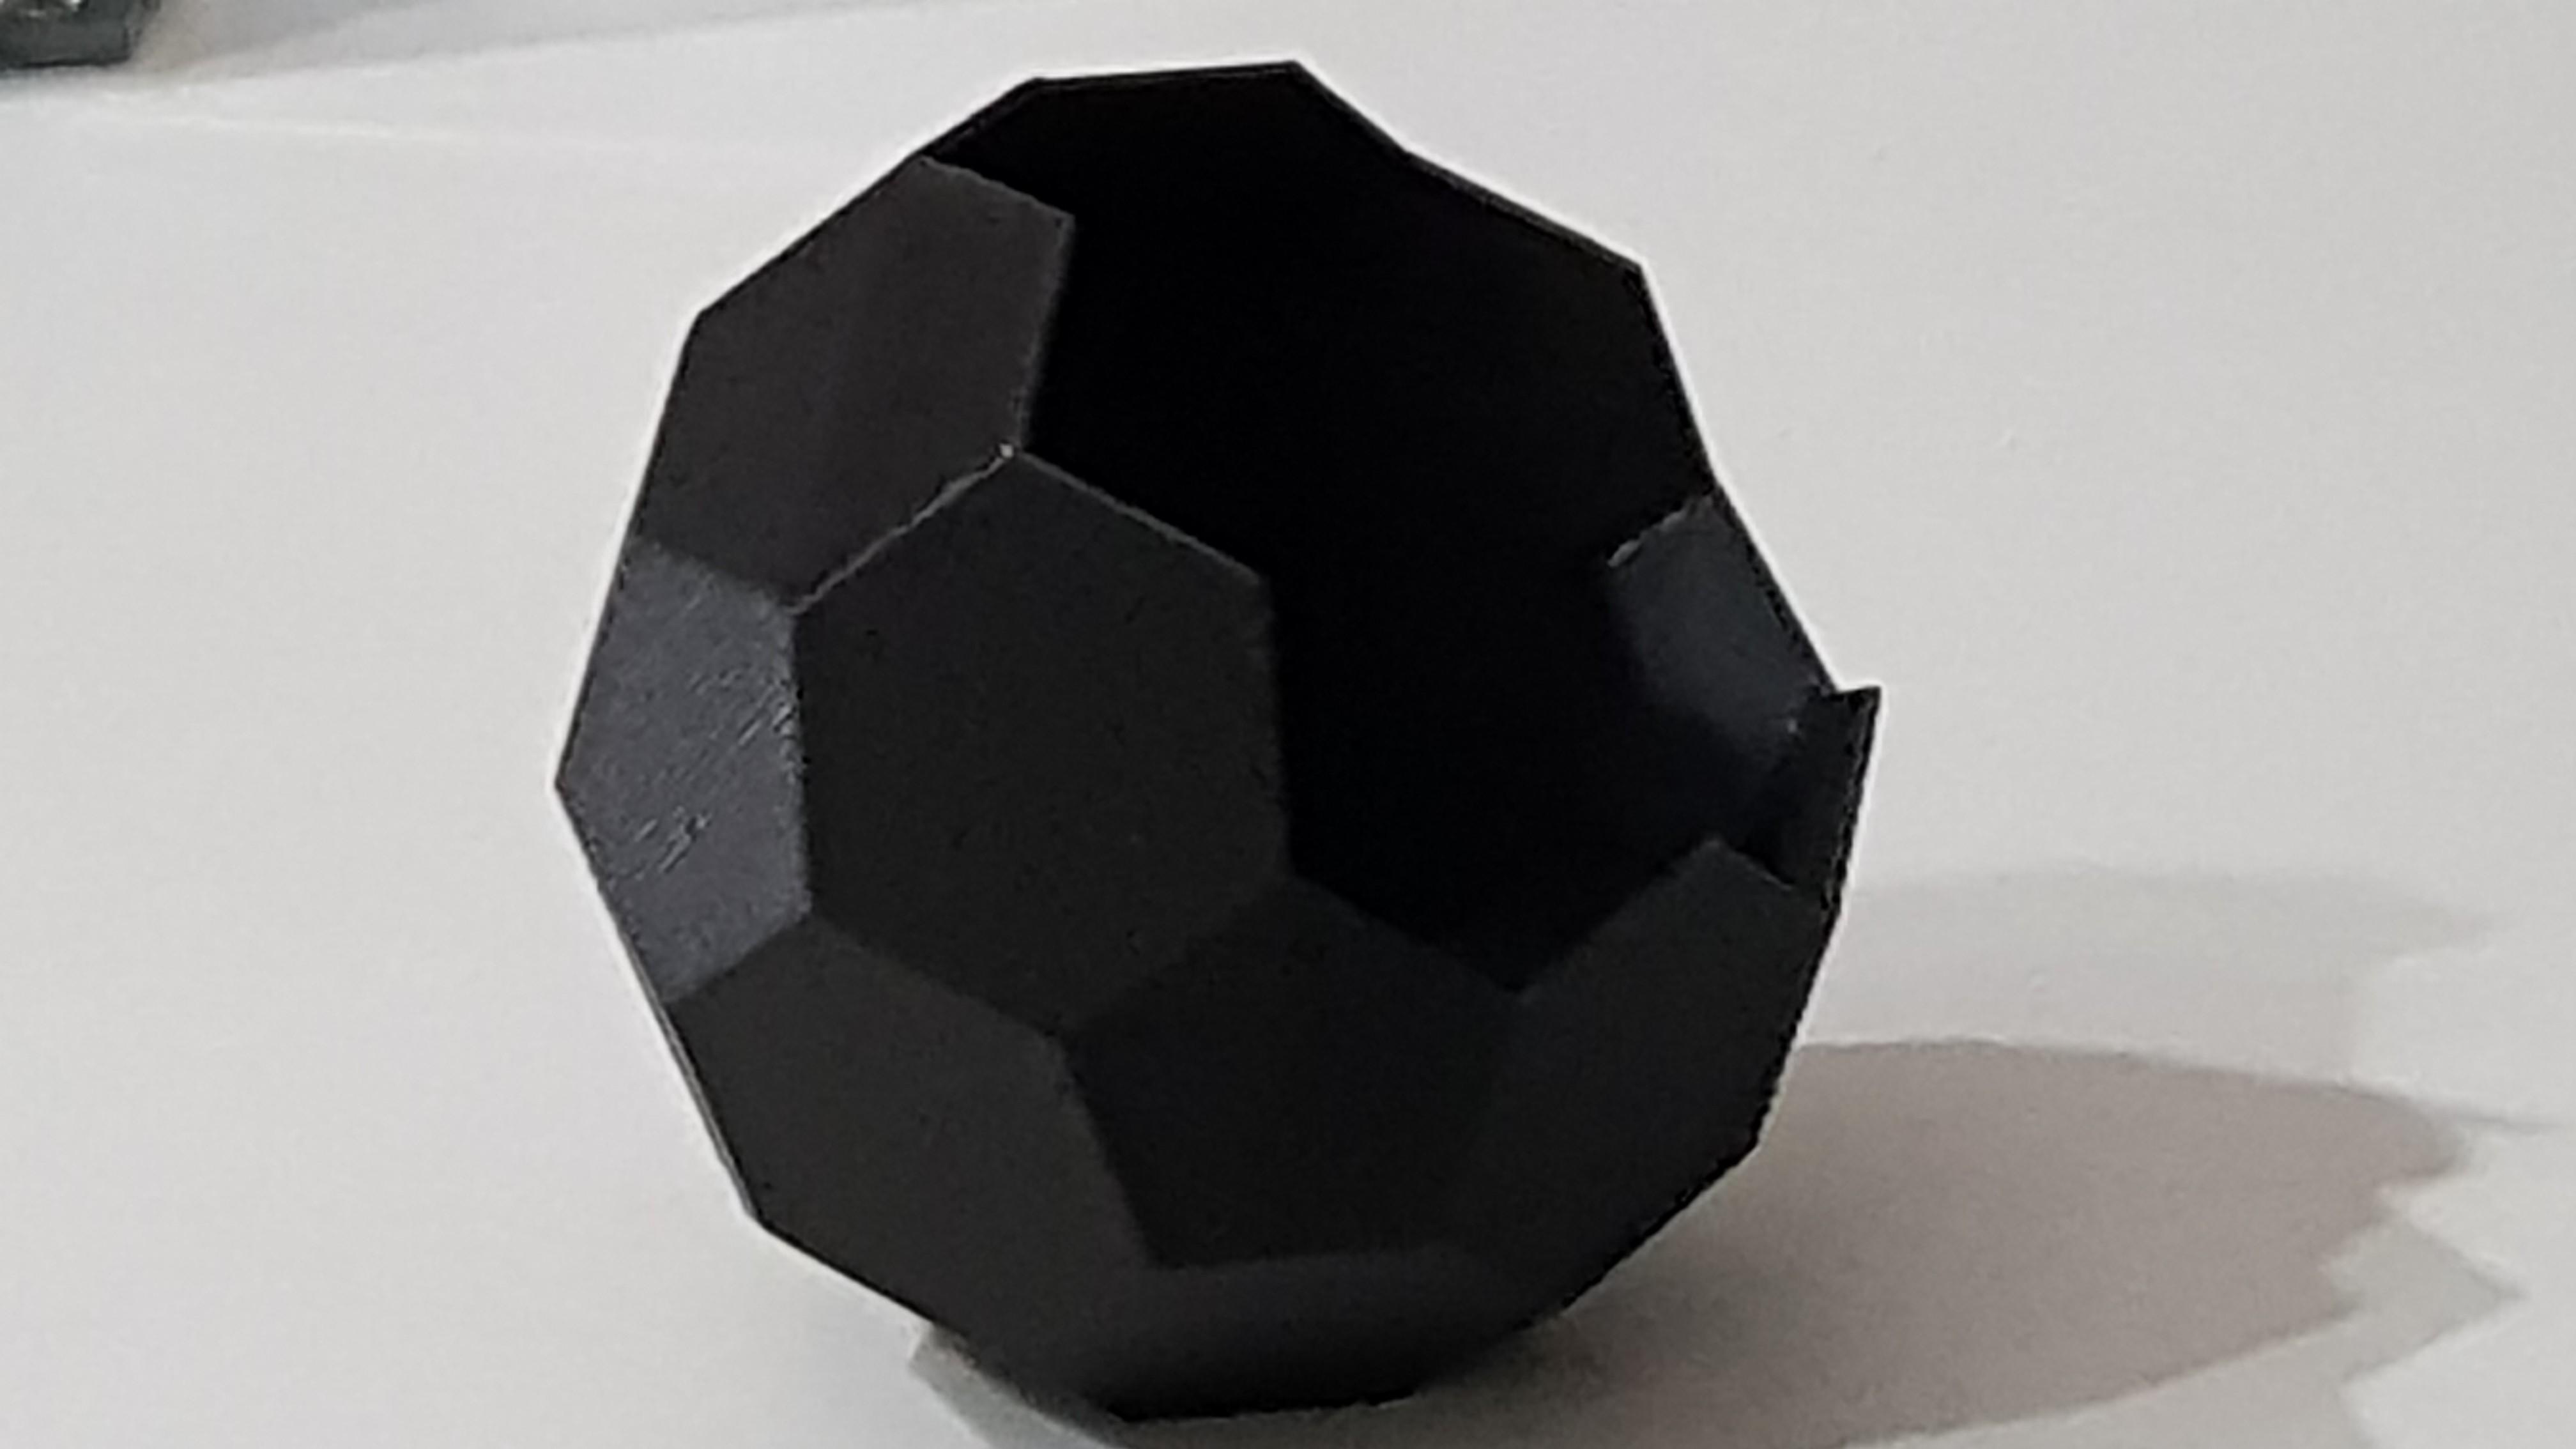 20180208_194139.jpg Download free STL file Mini planter • 3D printing design, solunkejagruti